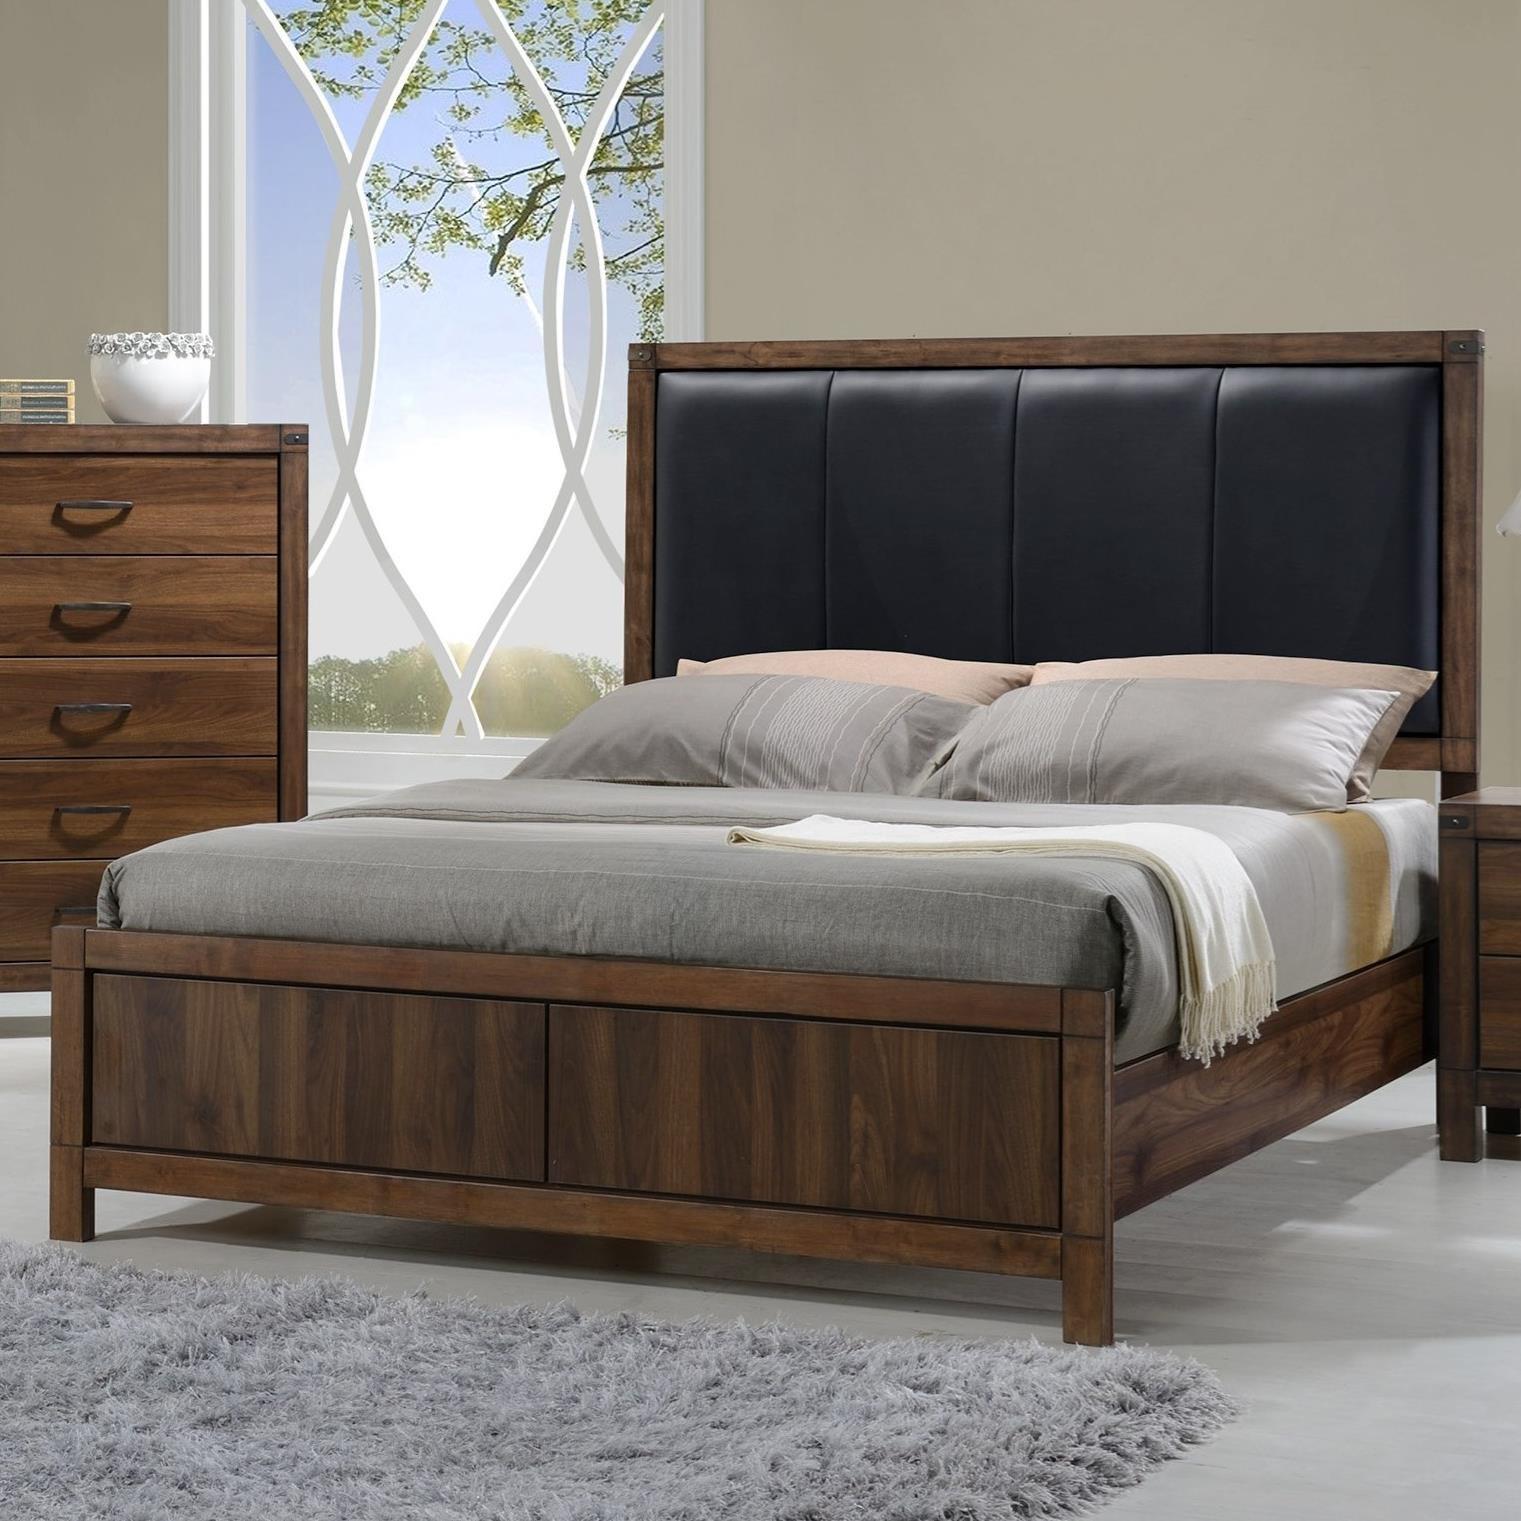 Belmont Queen Headboard And Footboard Bed